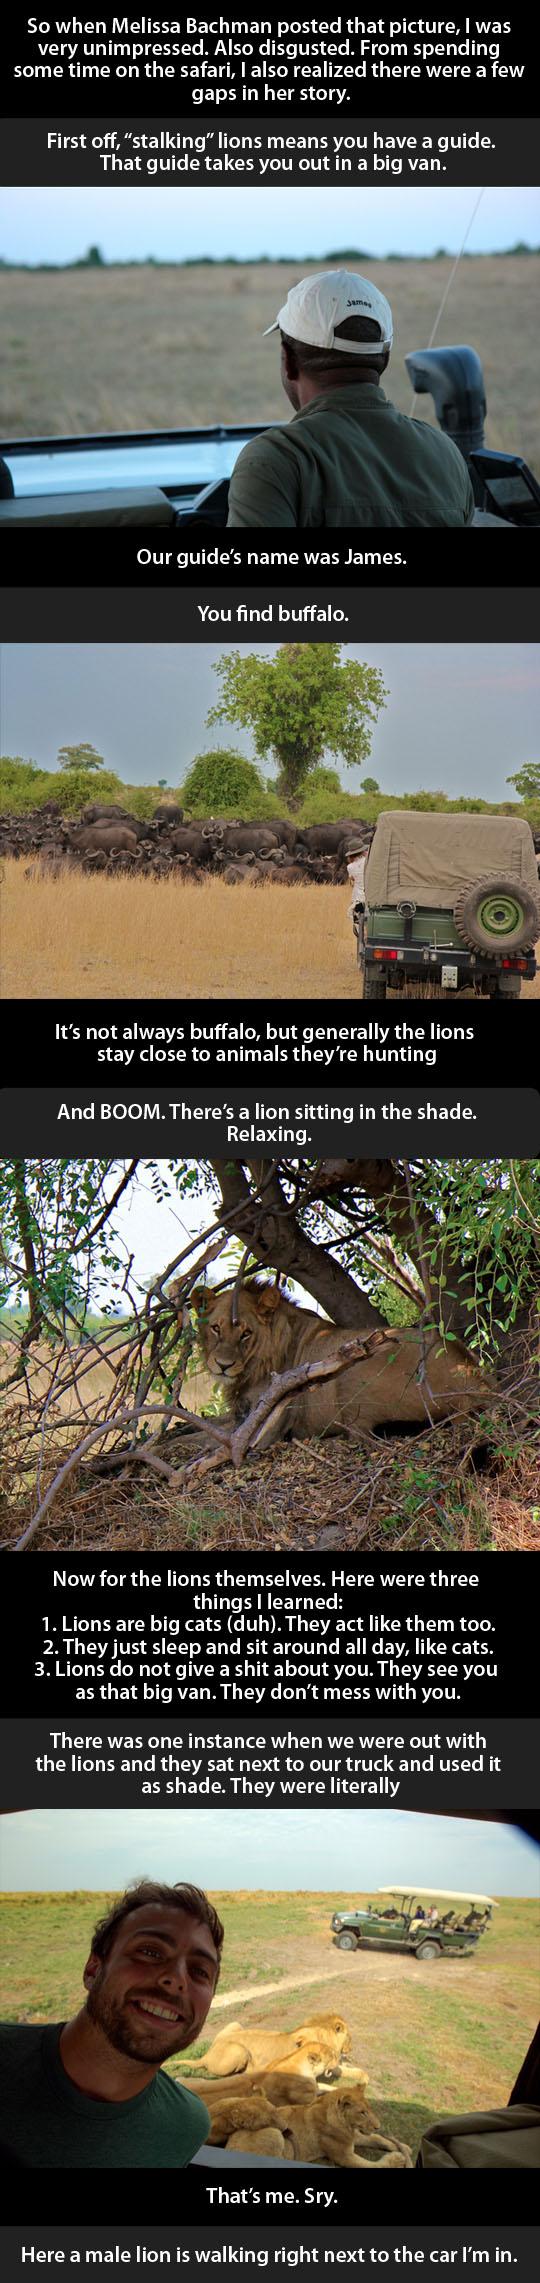 lion-Africa-hunter-car-wild